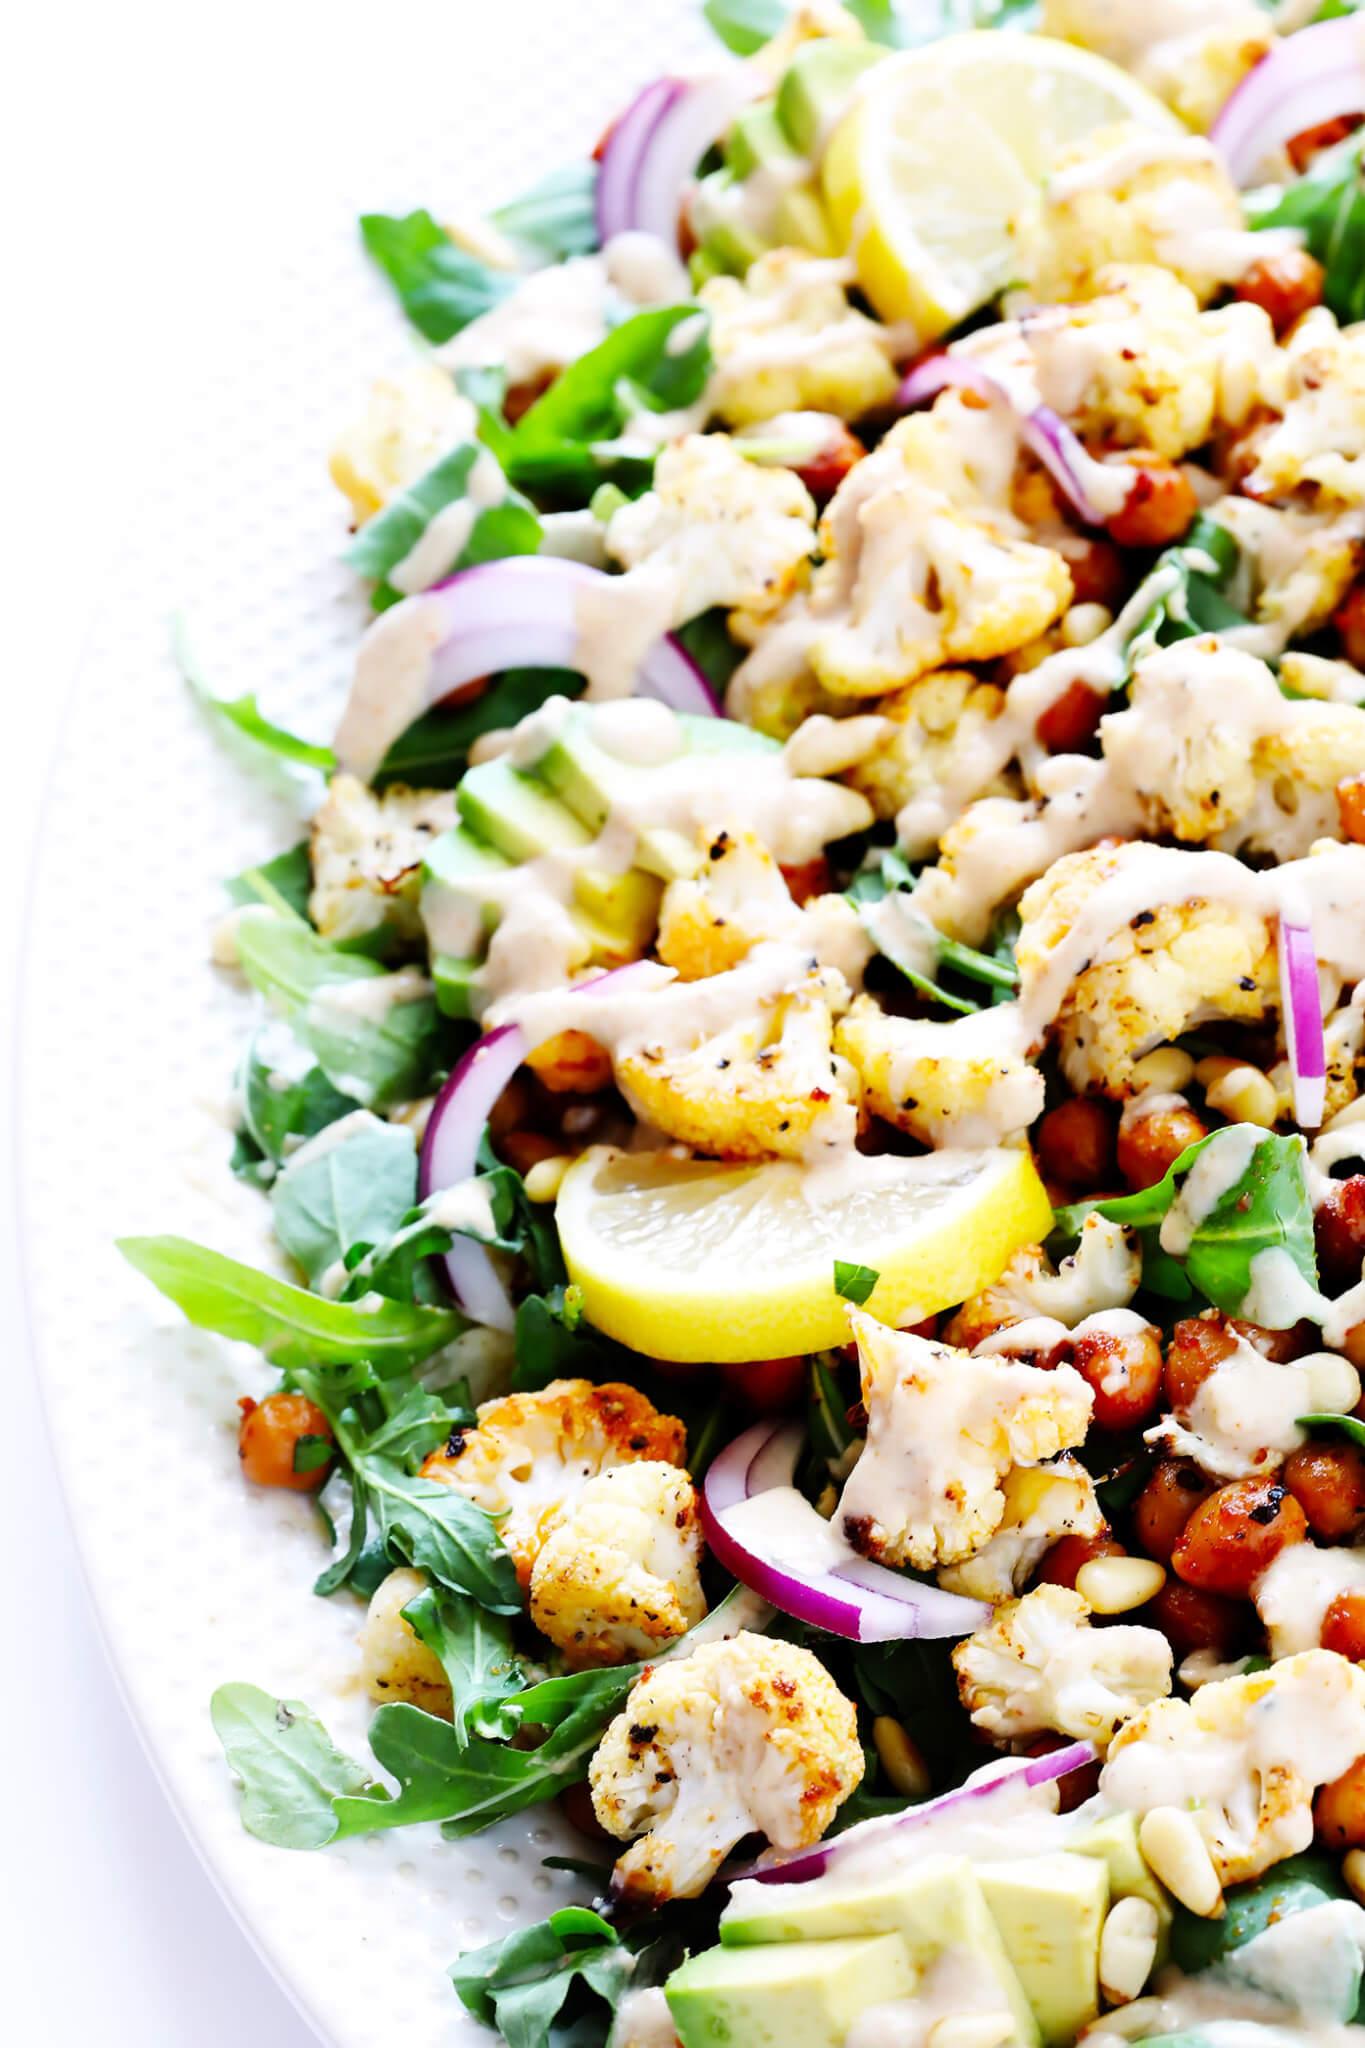 The BEST Roasted Cauliflower Salad with Chickpeas, Arugula and Tahini Dressing